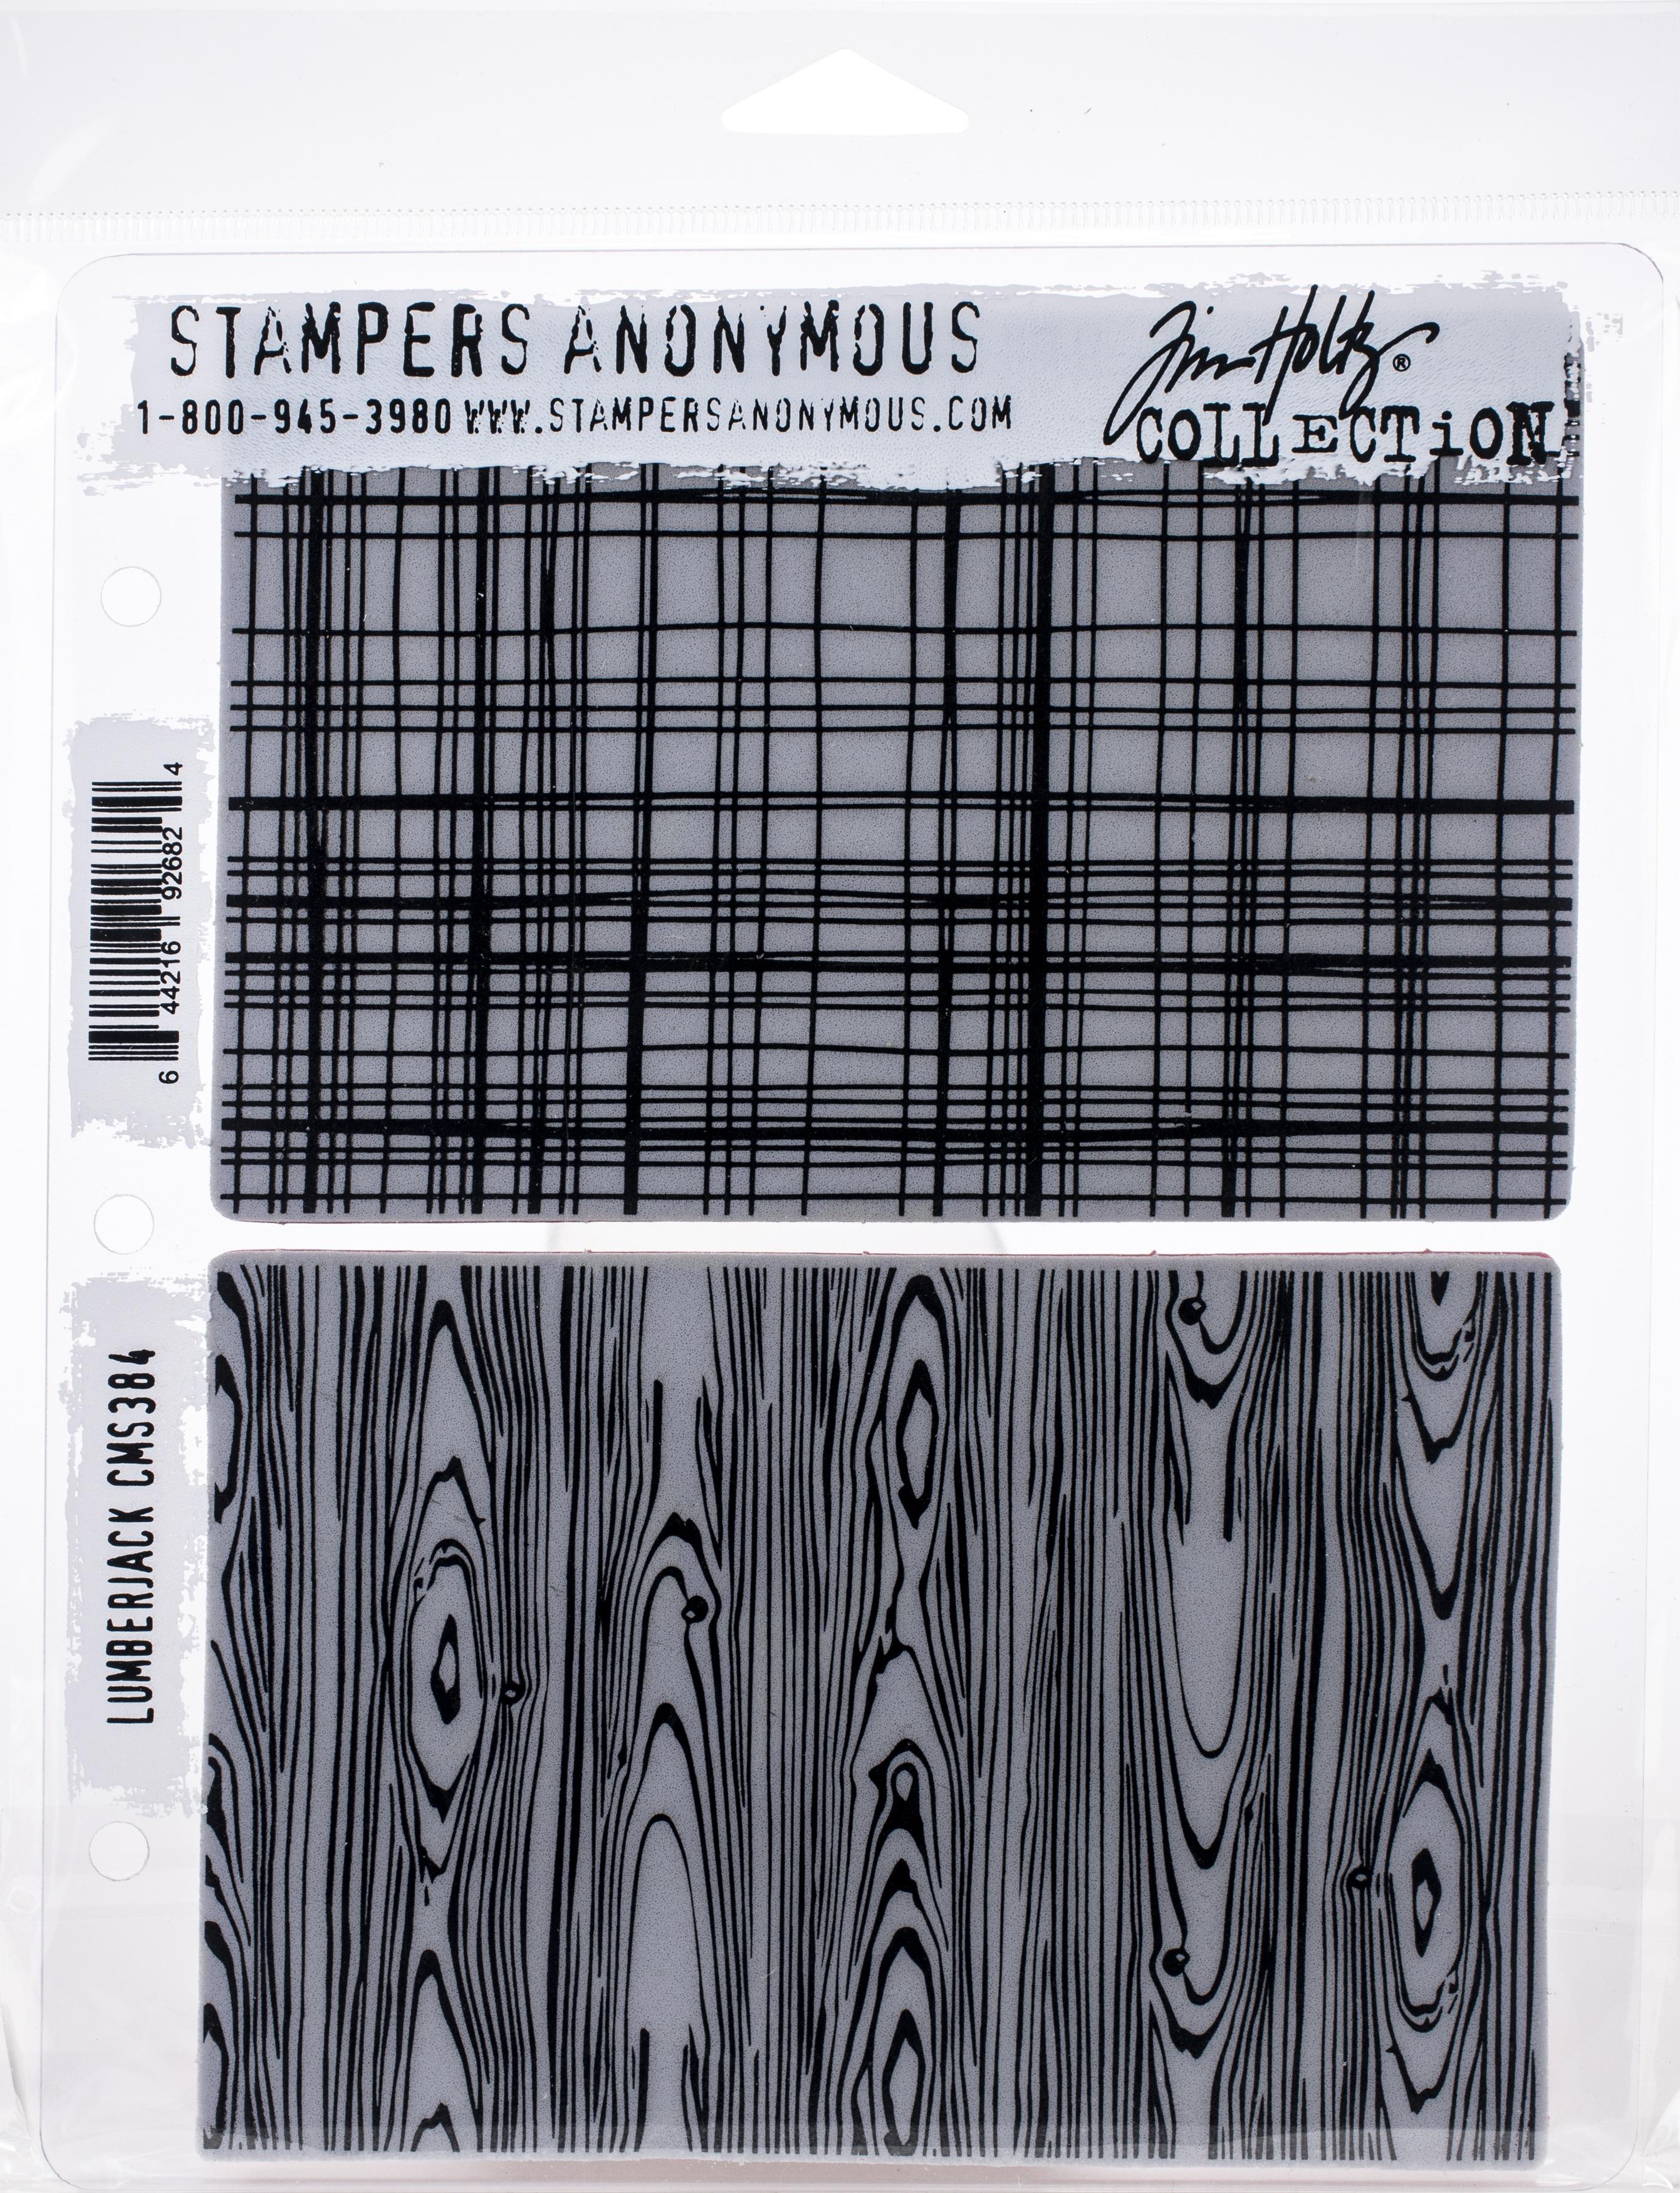 Tim Holtz Cling Stamps 7X8.5-Lumberjack